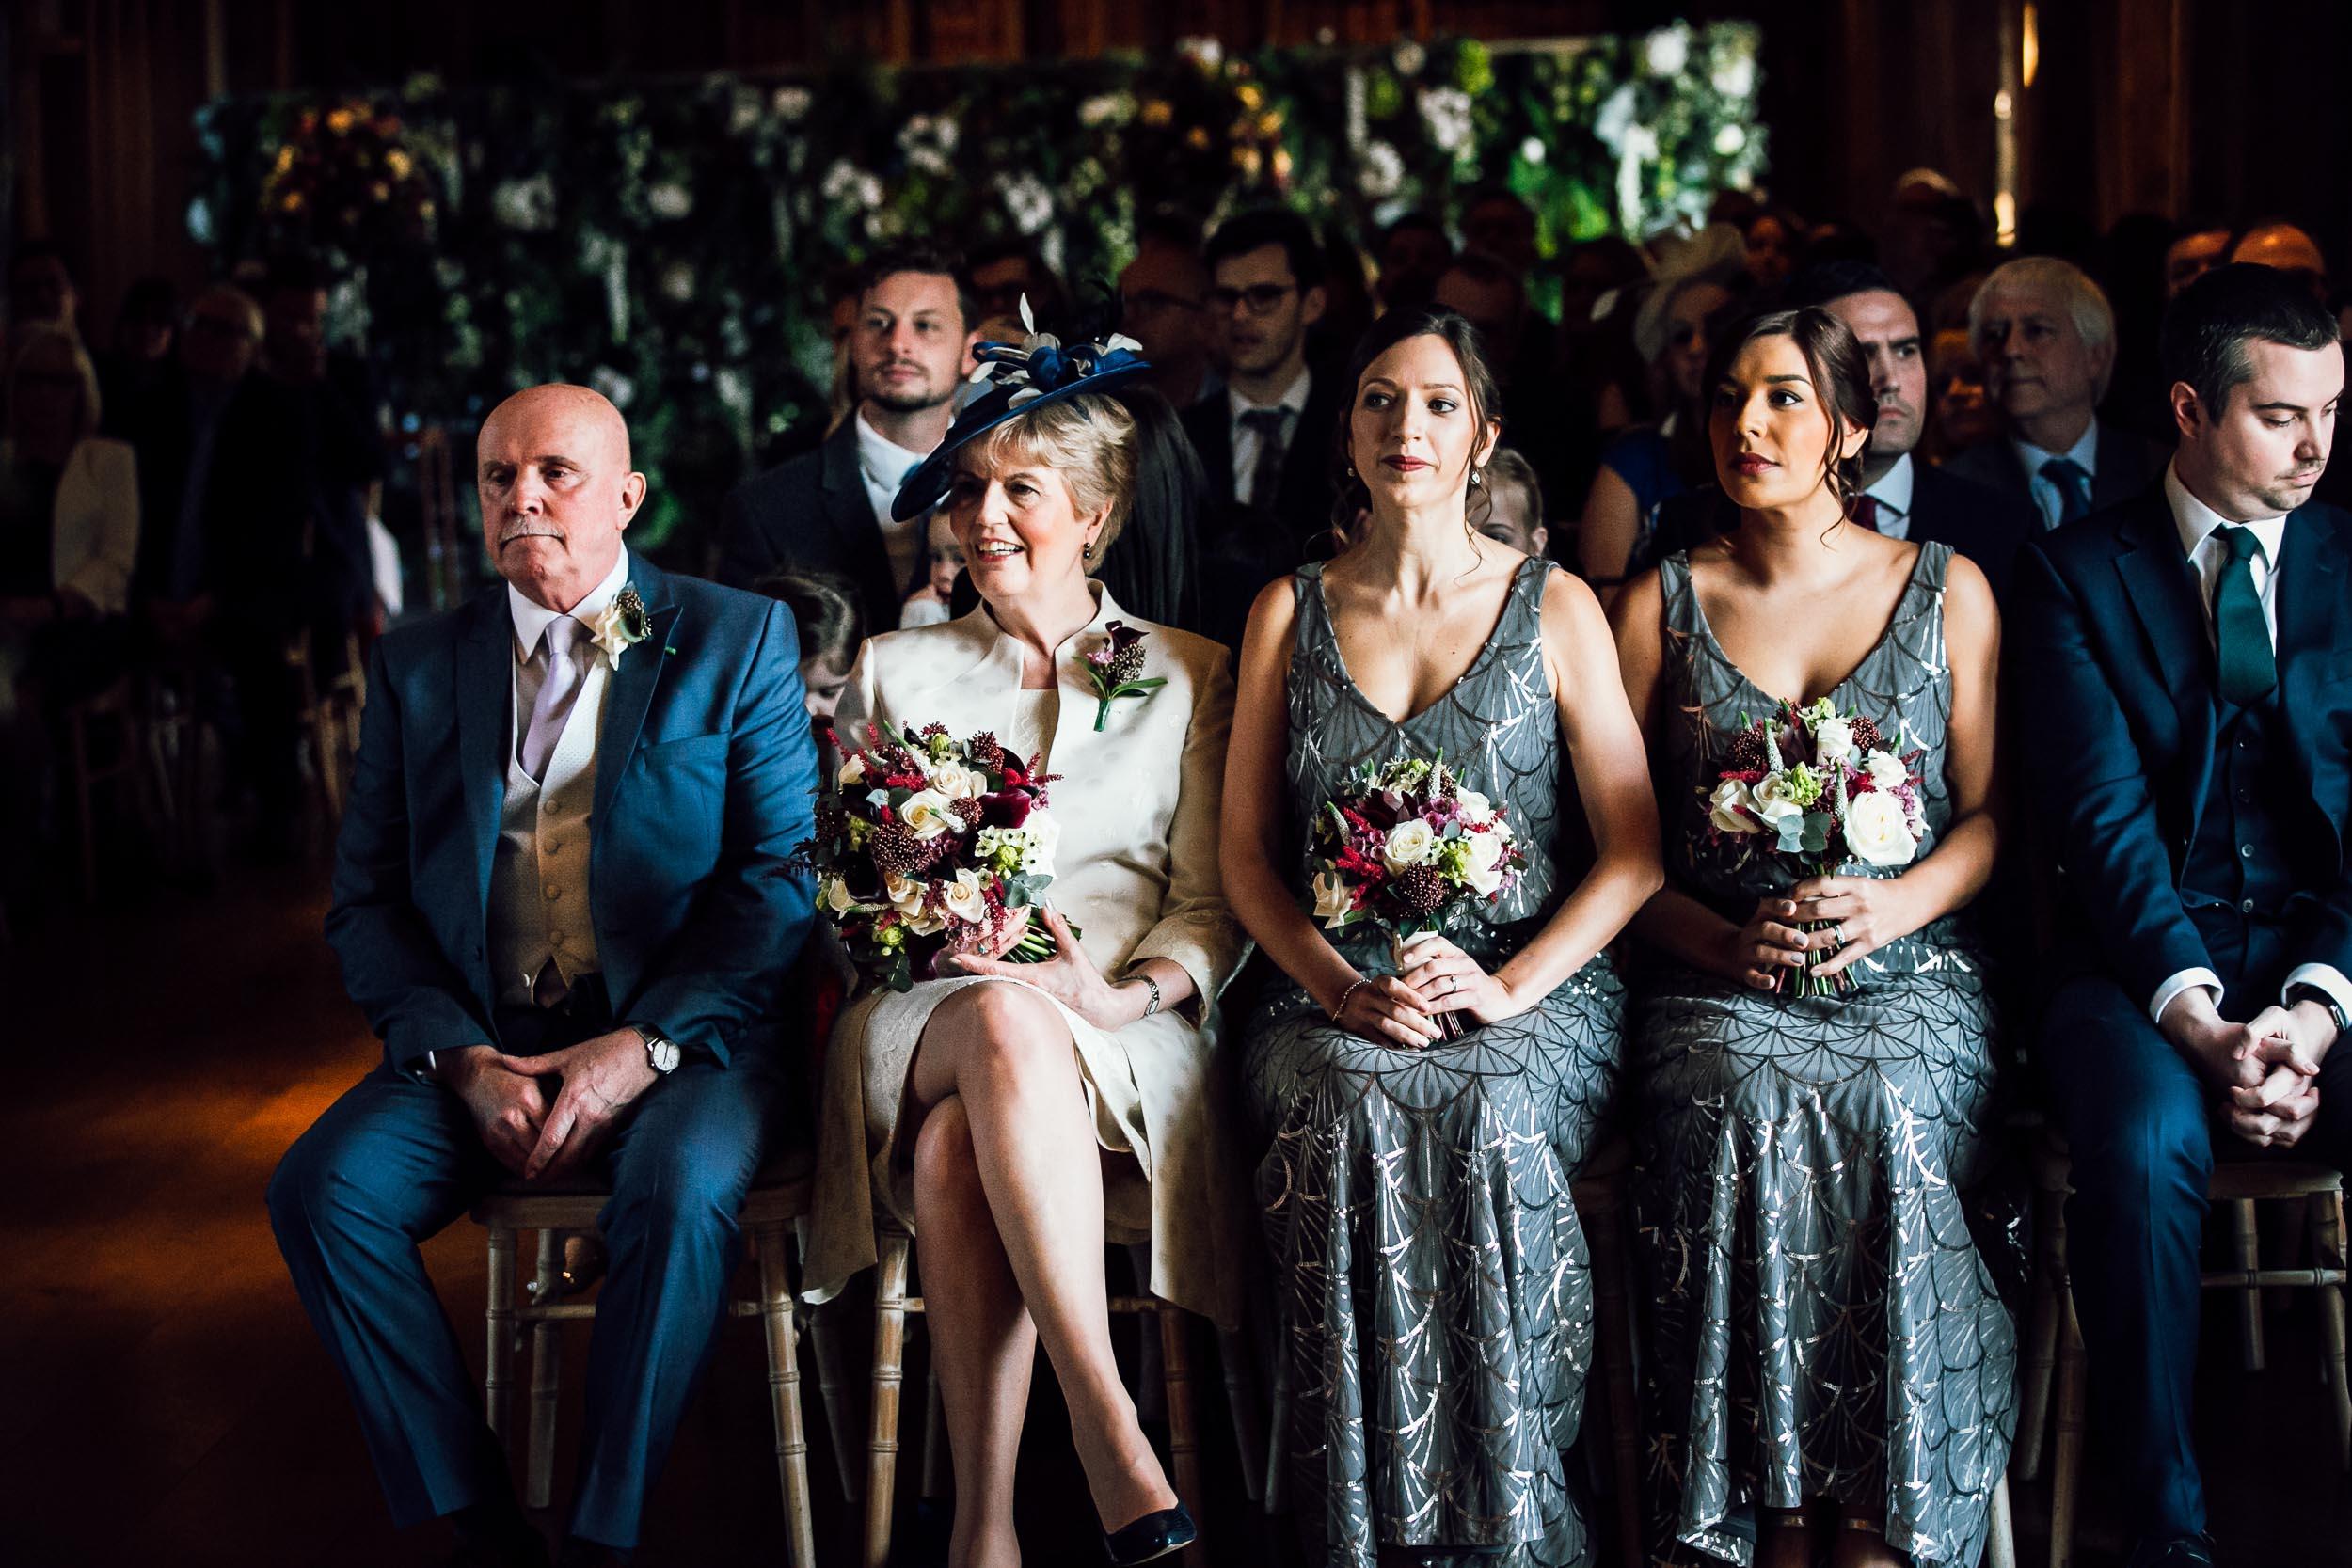 micklefield-hall-wedding-photographer 026.jpg